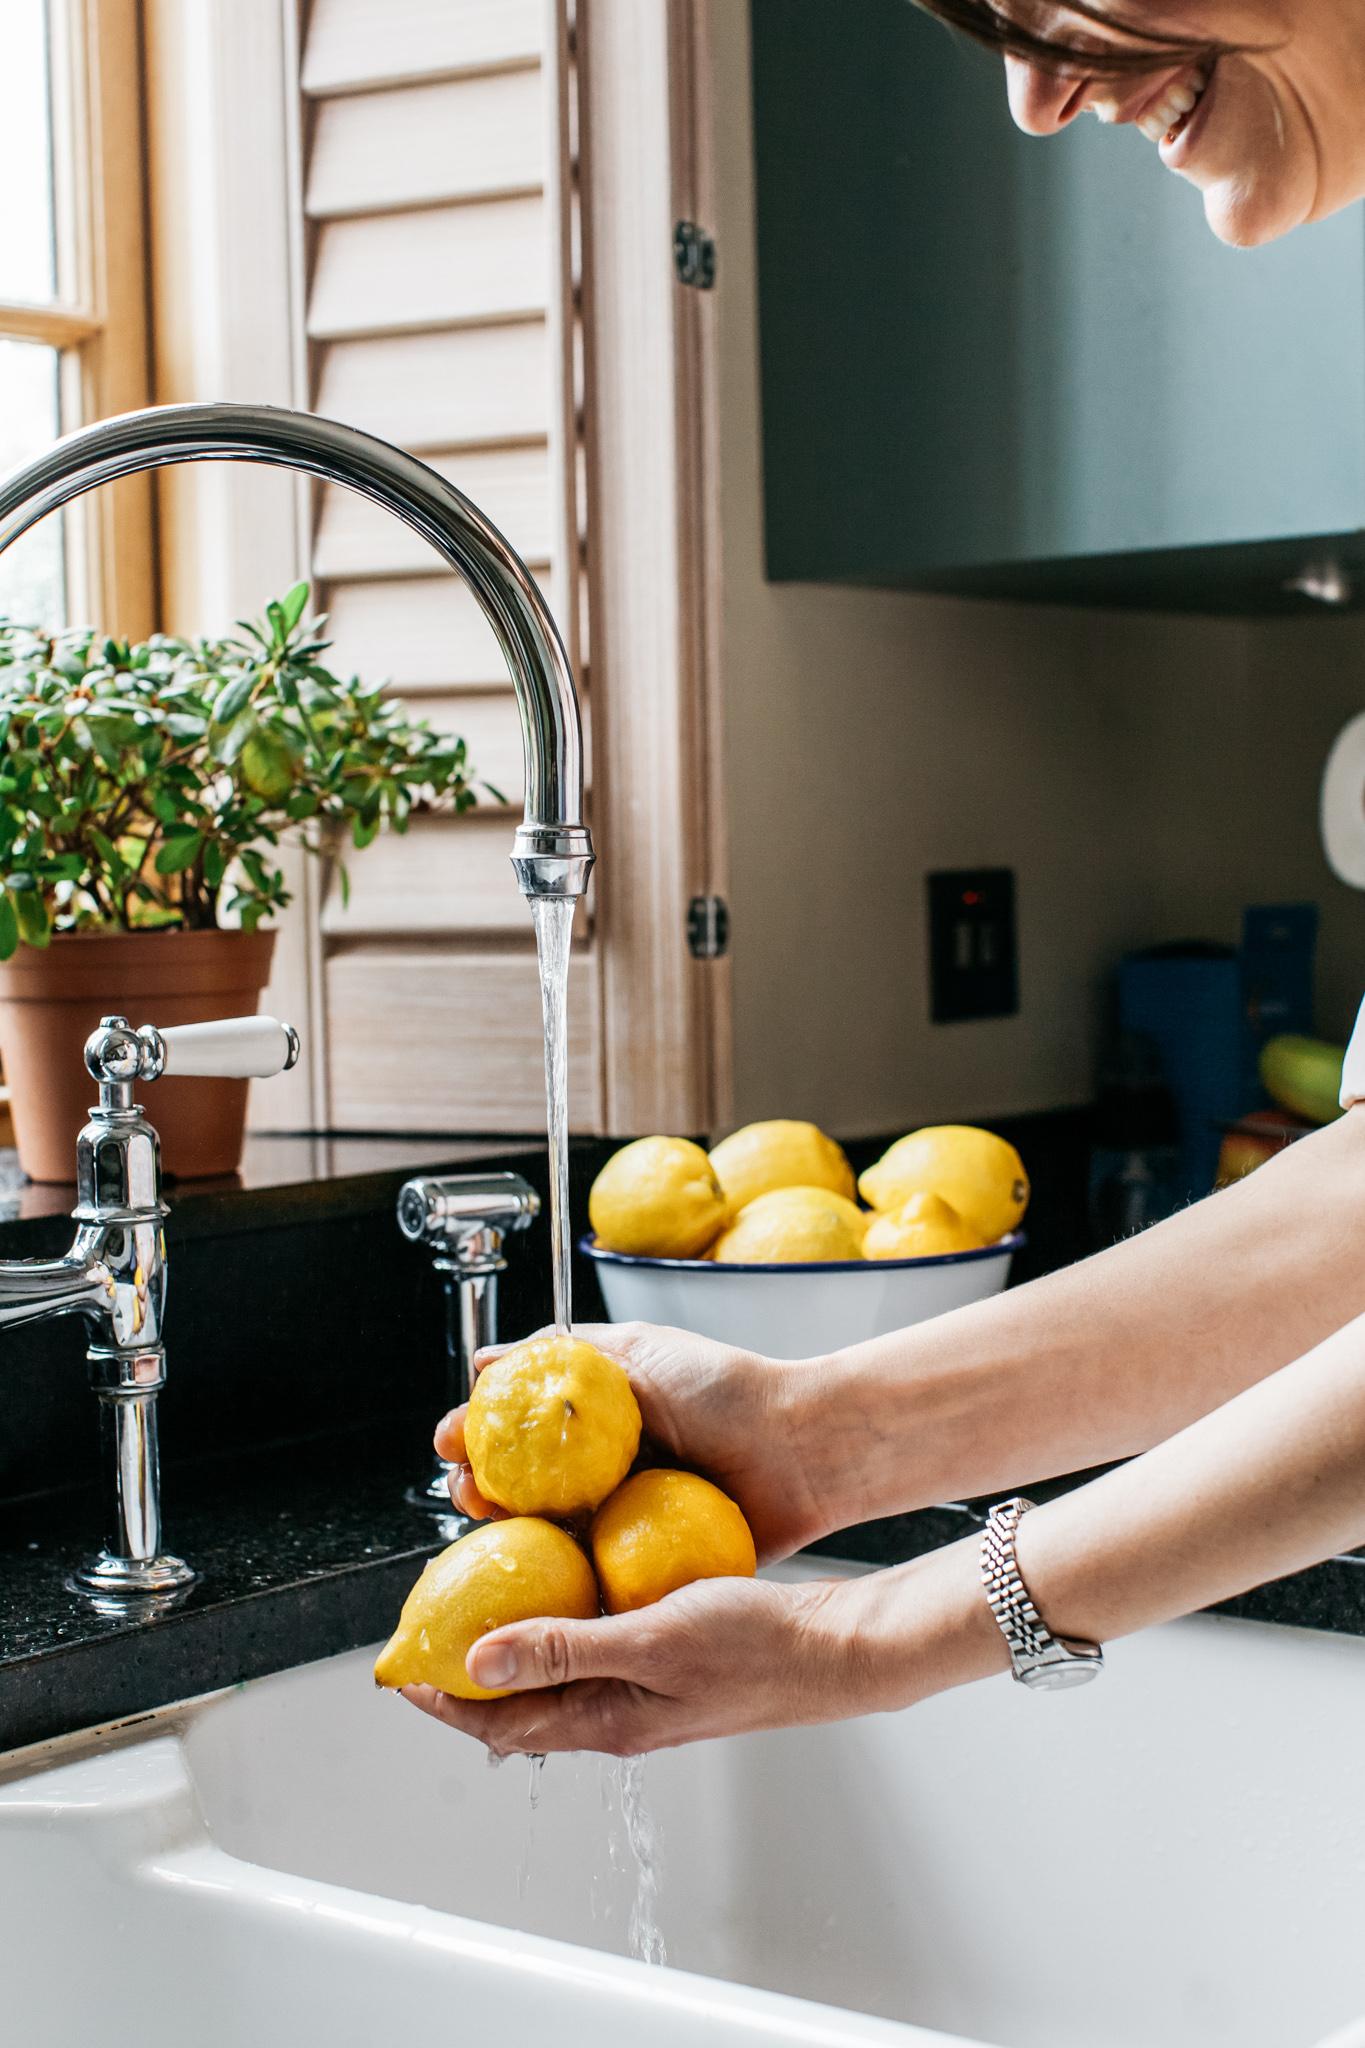 Washing lemons Food lifestyle photography for Bare Biology by Emma Gutteridge